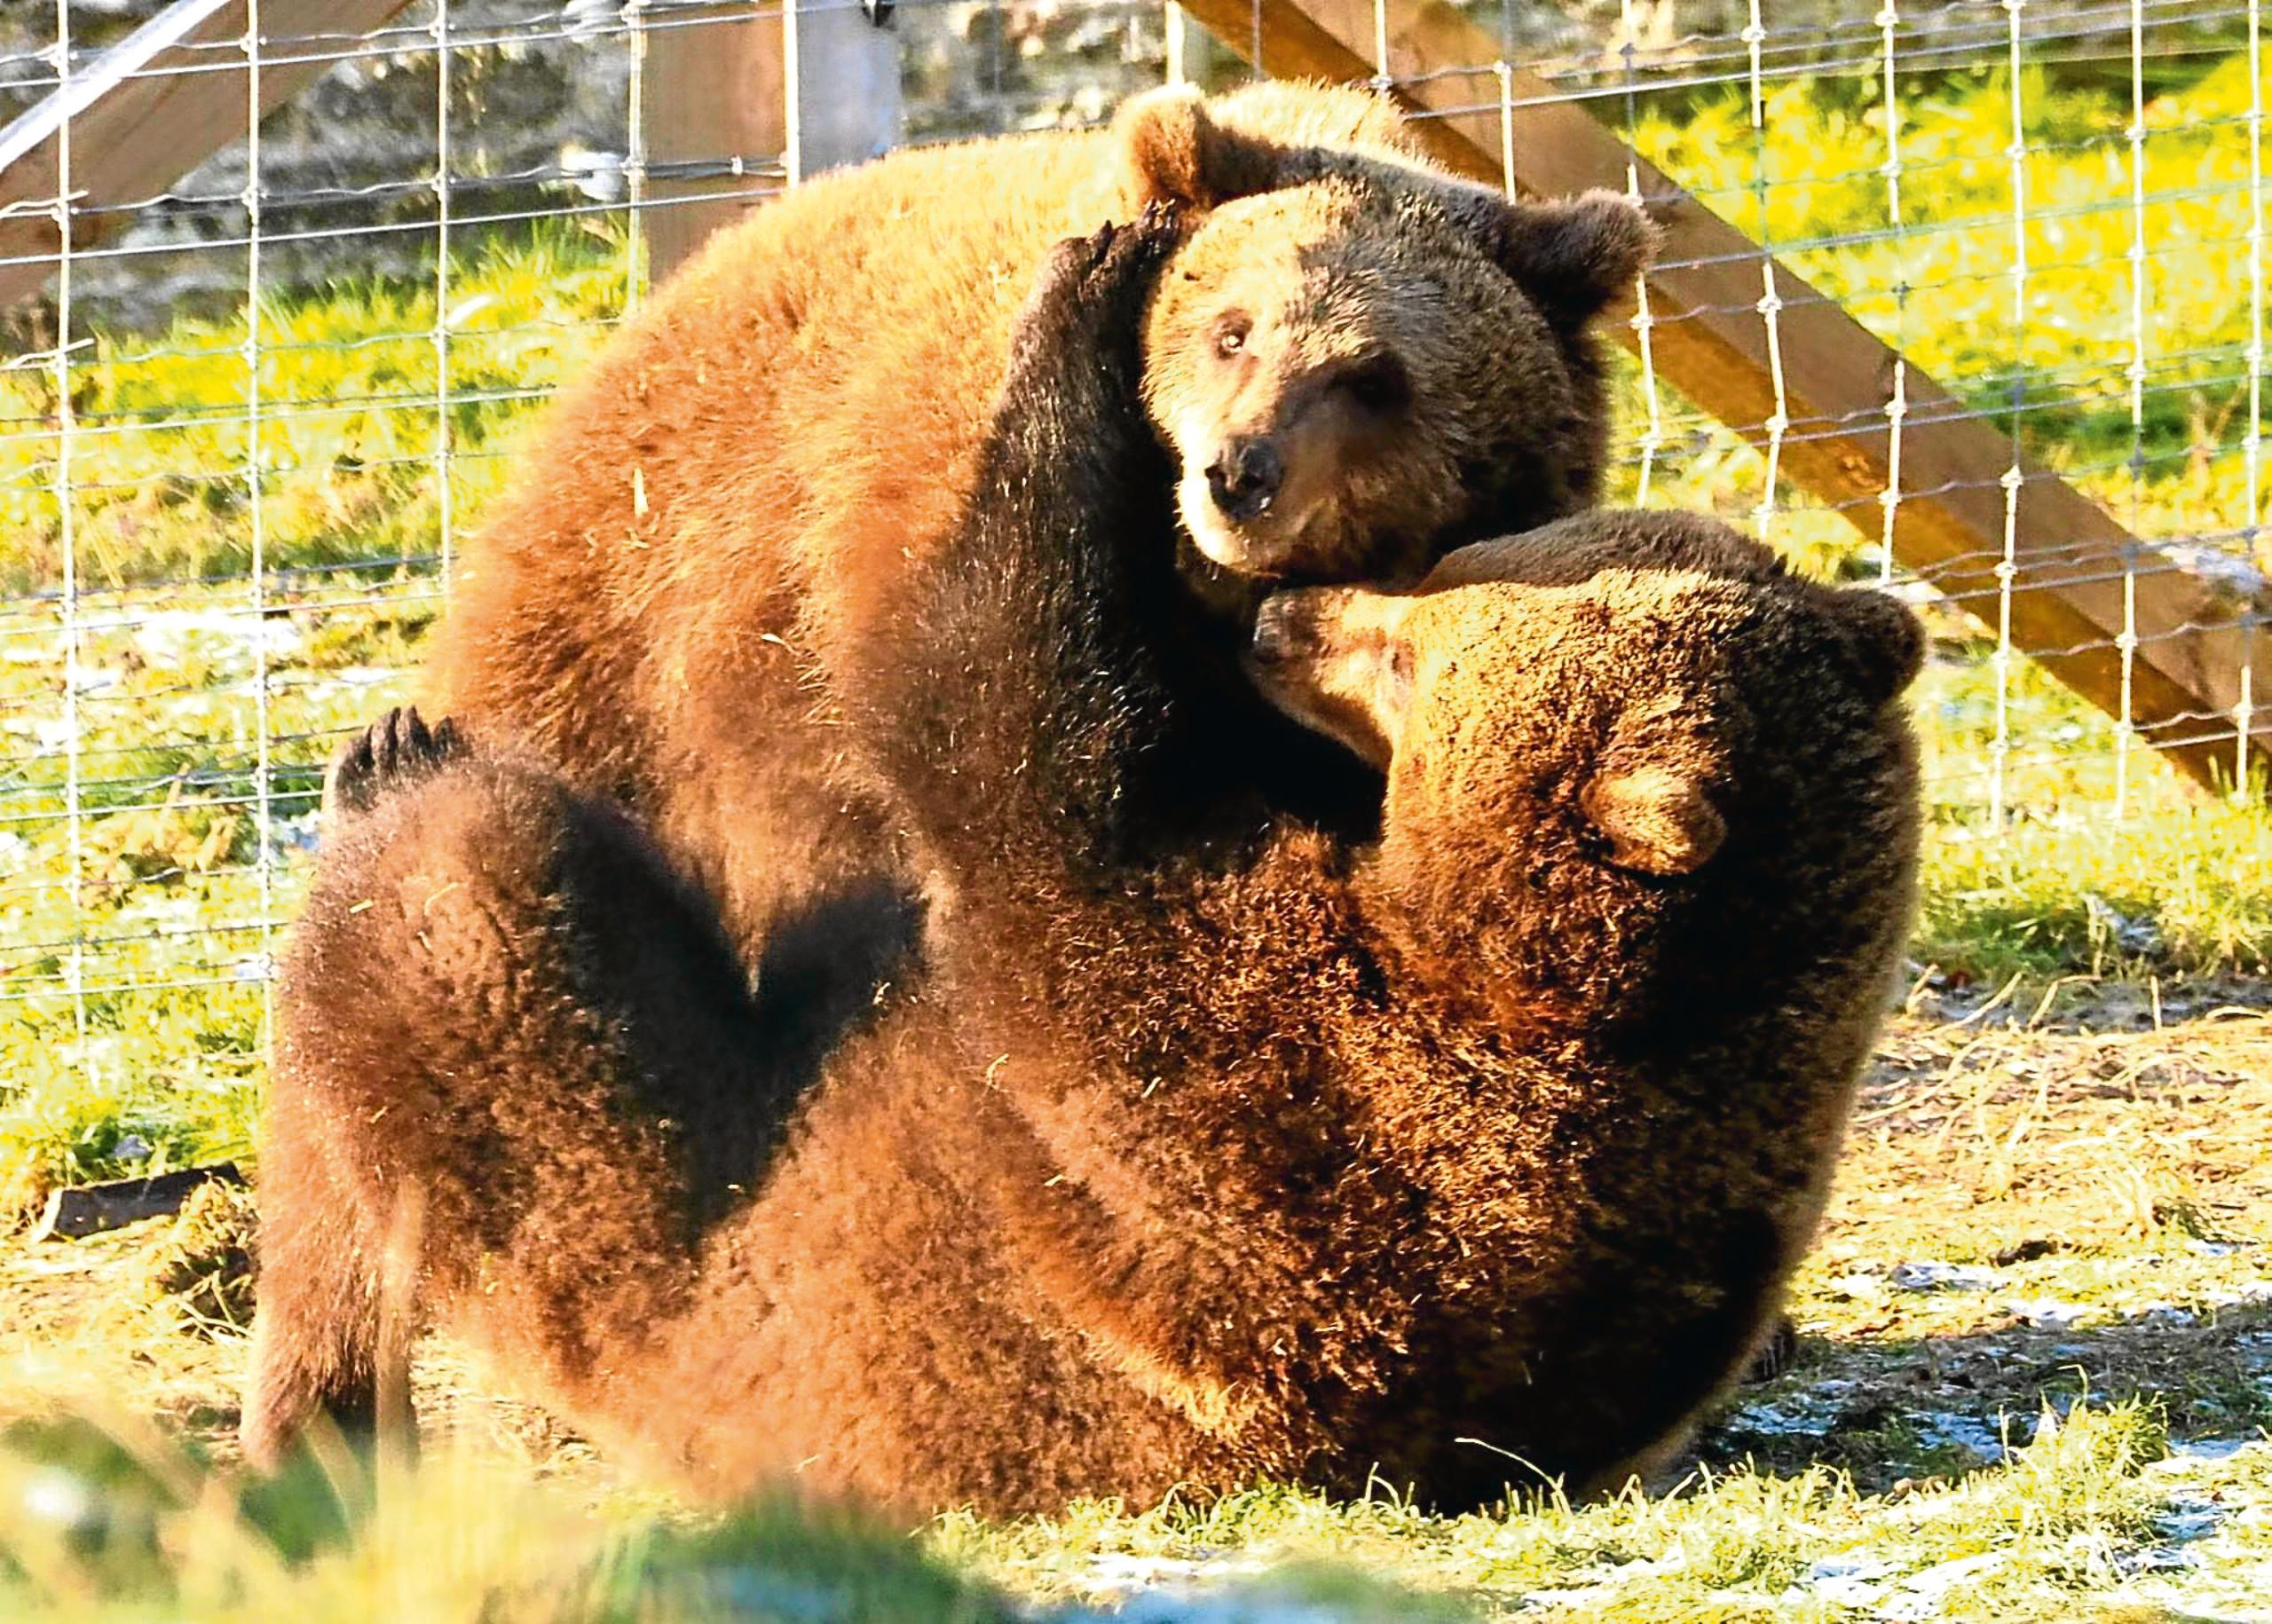 Camperdown Bears taken from Friends of Camperdown Wildlife Centre FB page.